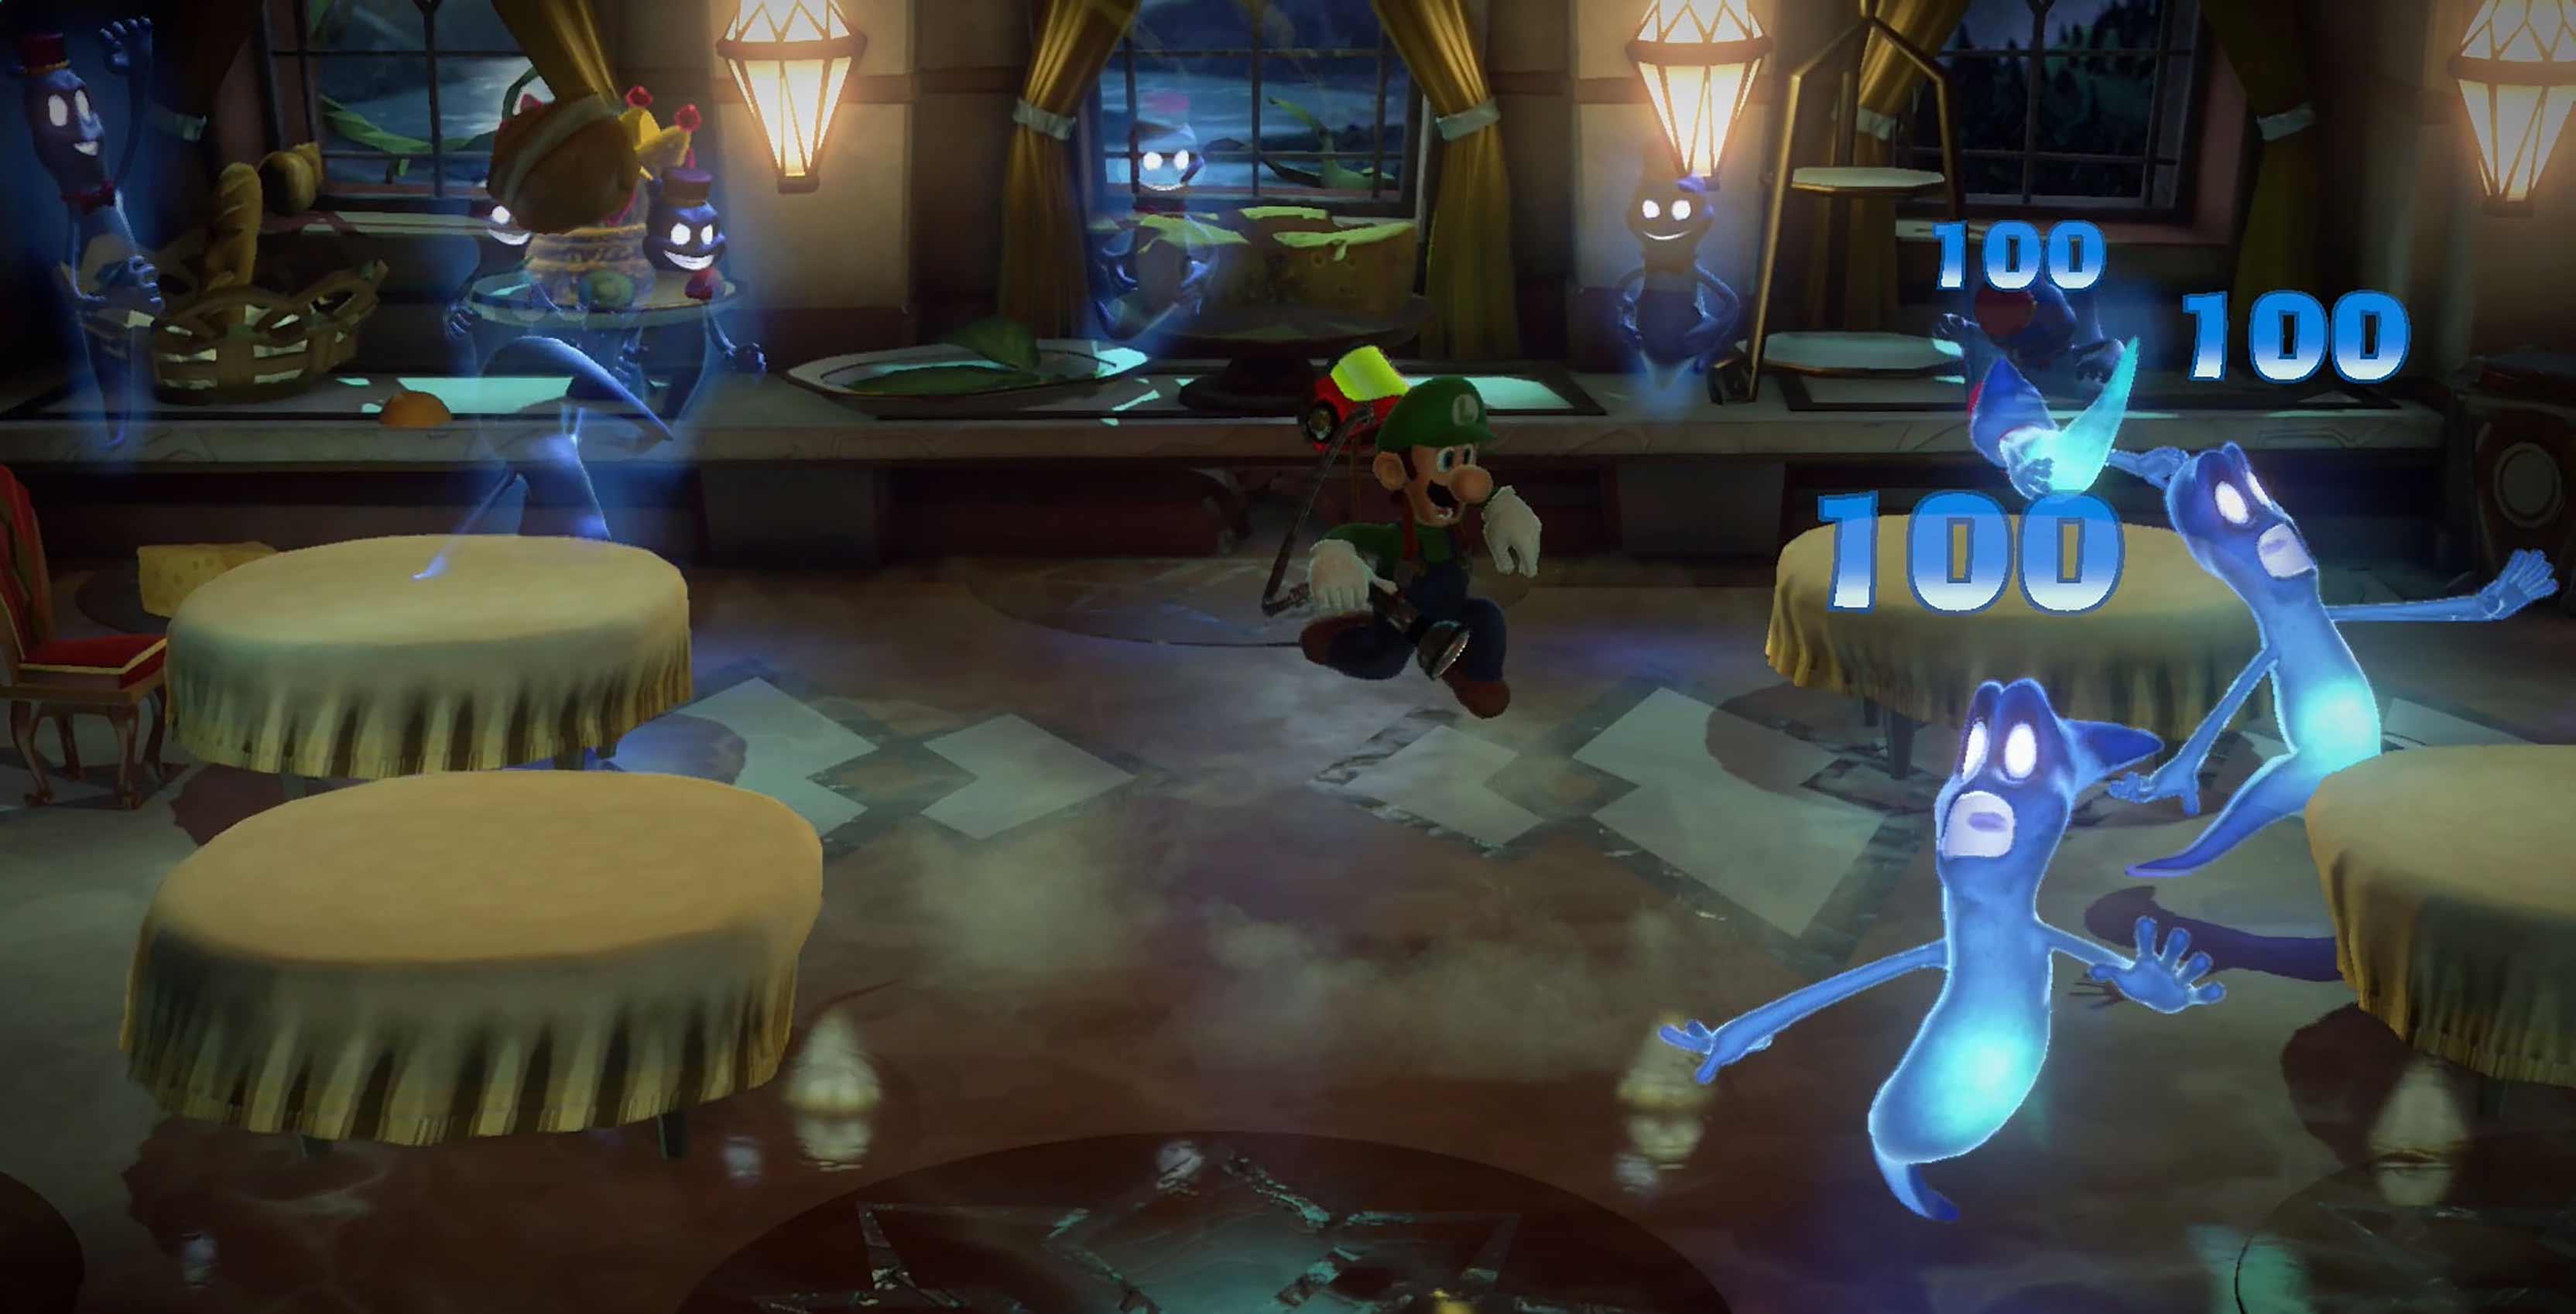 Canadian-developed Luigi's Mansion 3